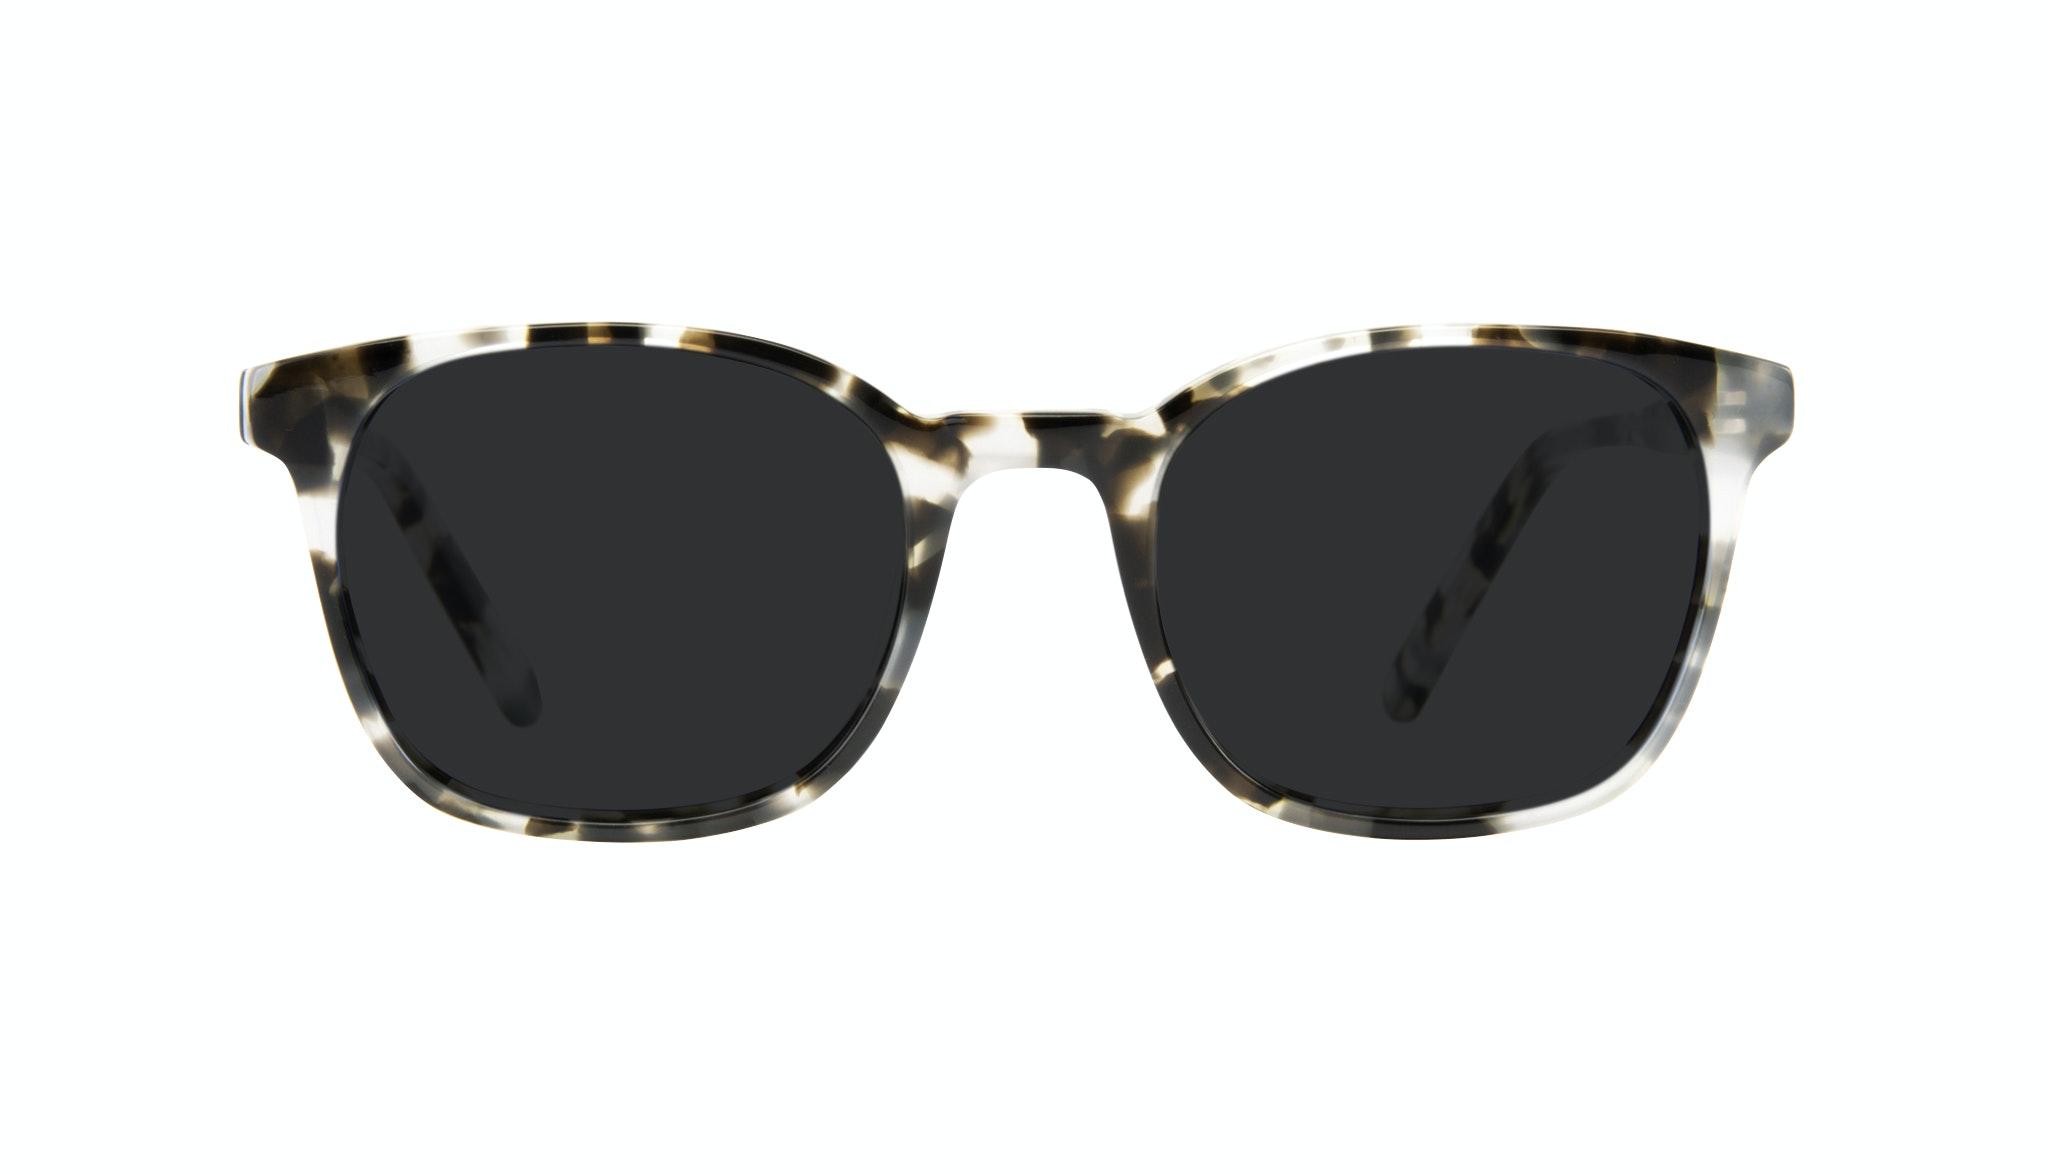 Affordable Fashion Glasses Rectangle Square Sunglasses Men Peak Camo Tort Front